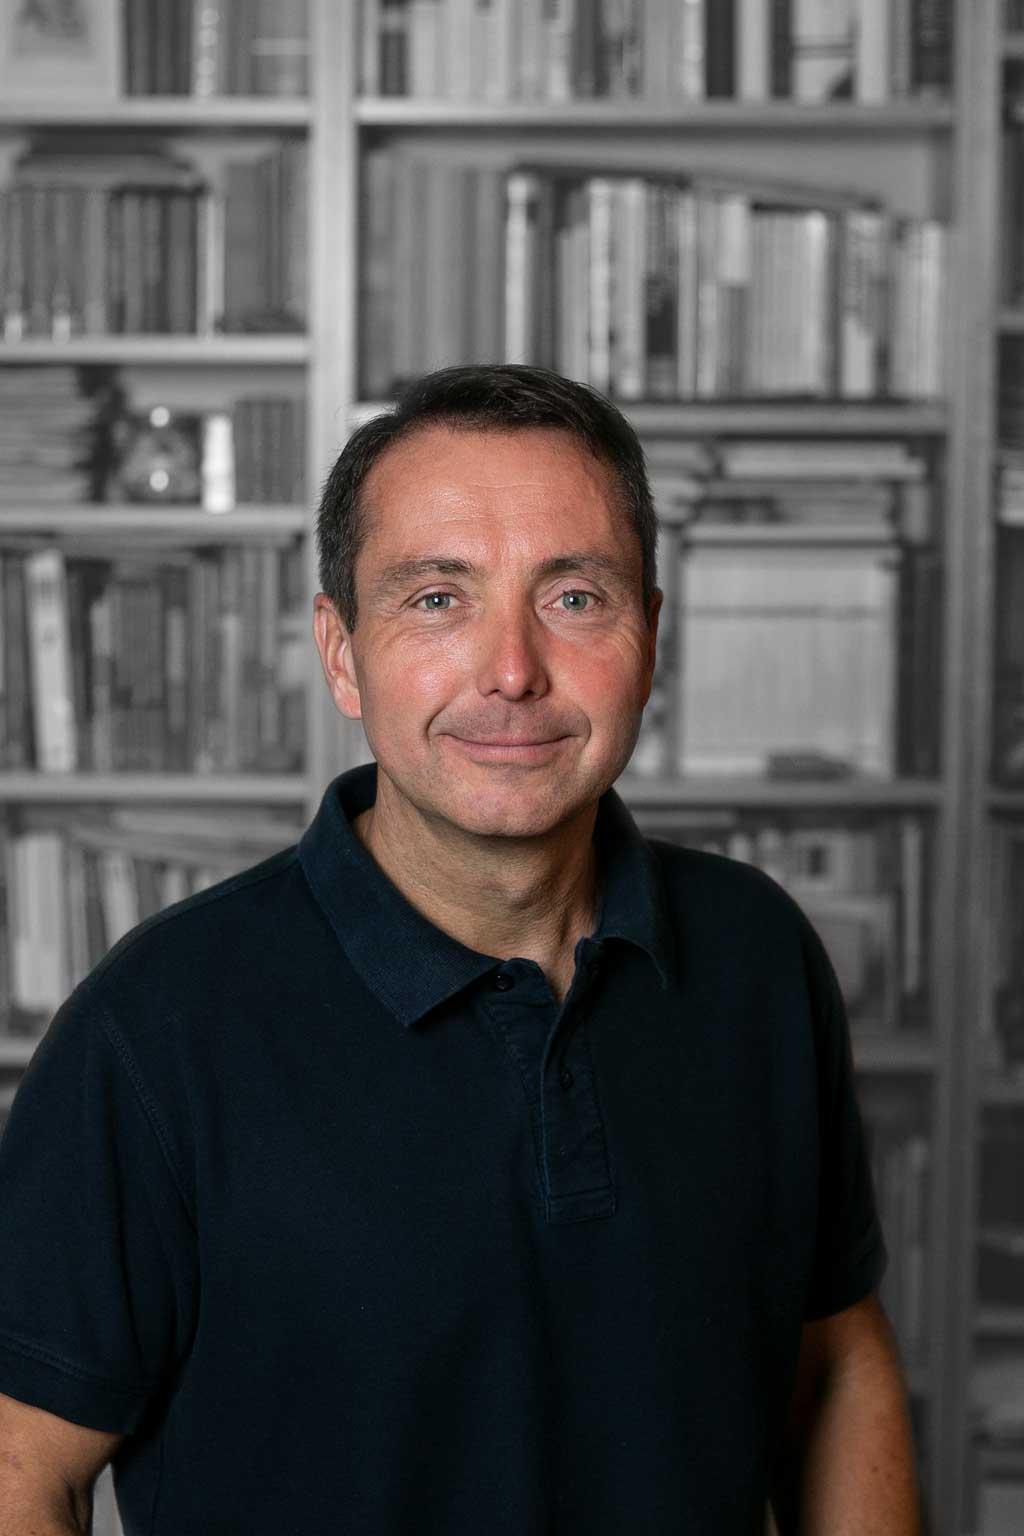 Profilfoto Dr. med. Stefan Böhmer - Orthopädie Böhmer in Kolbermoor